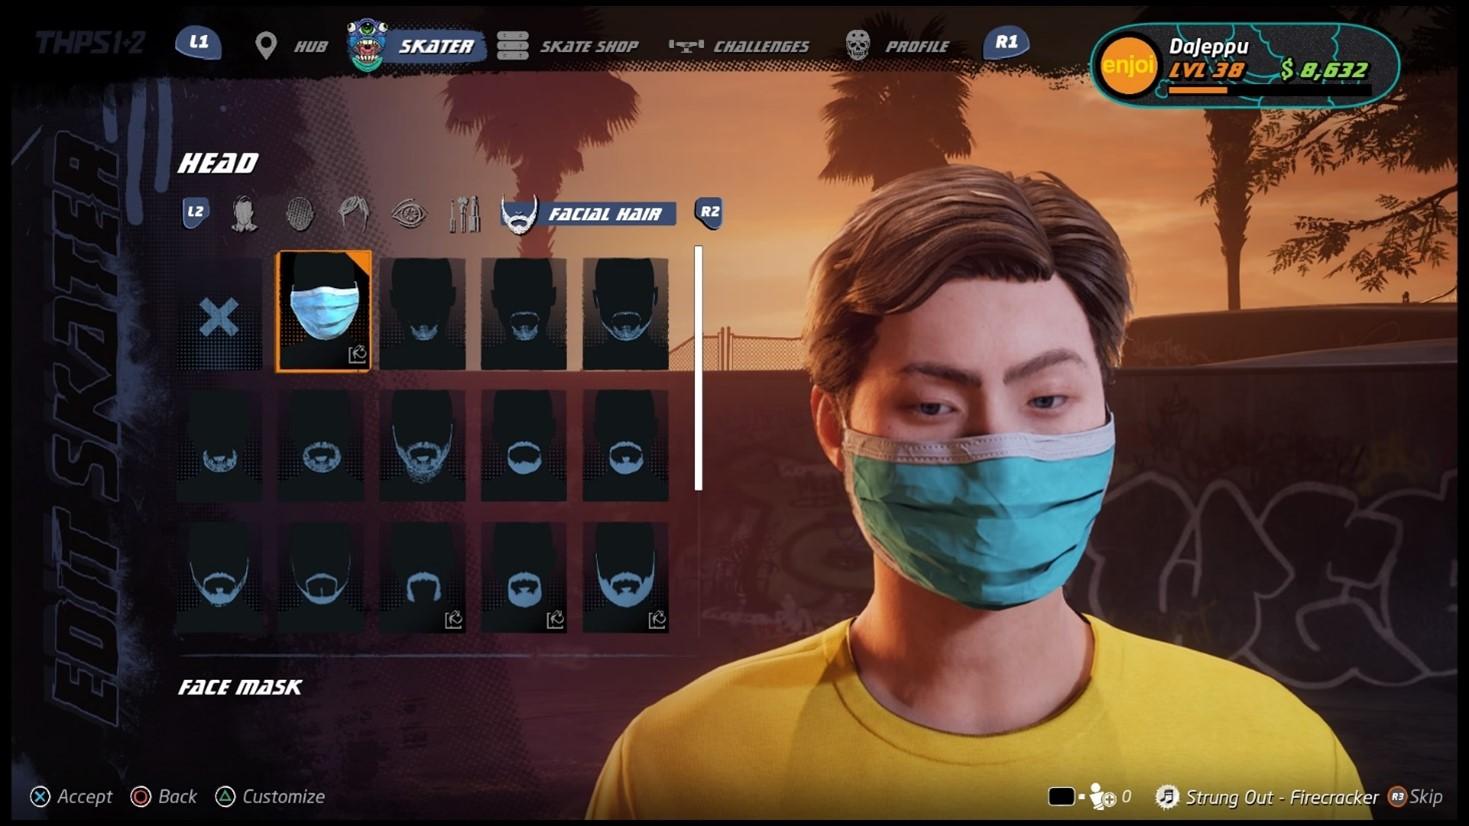 Player in customization menu wearing a face mask.